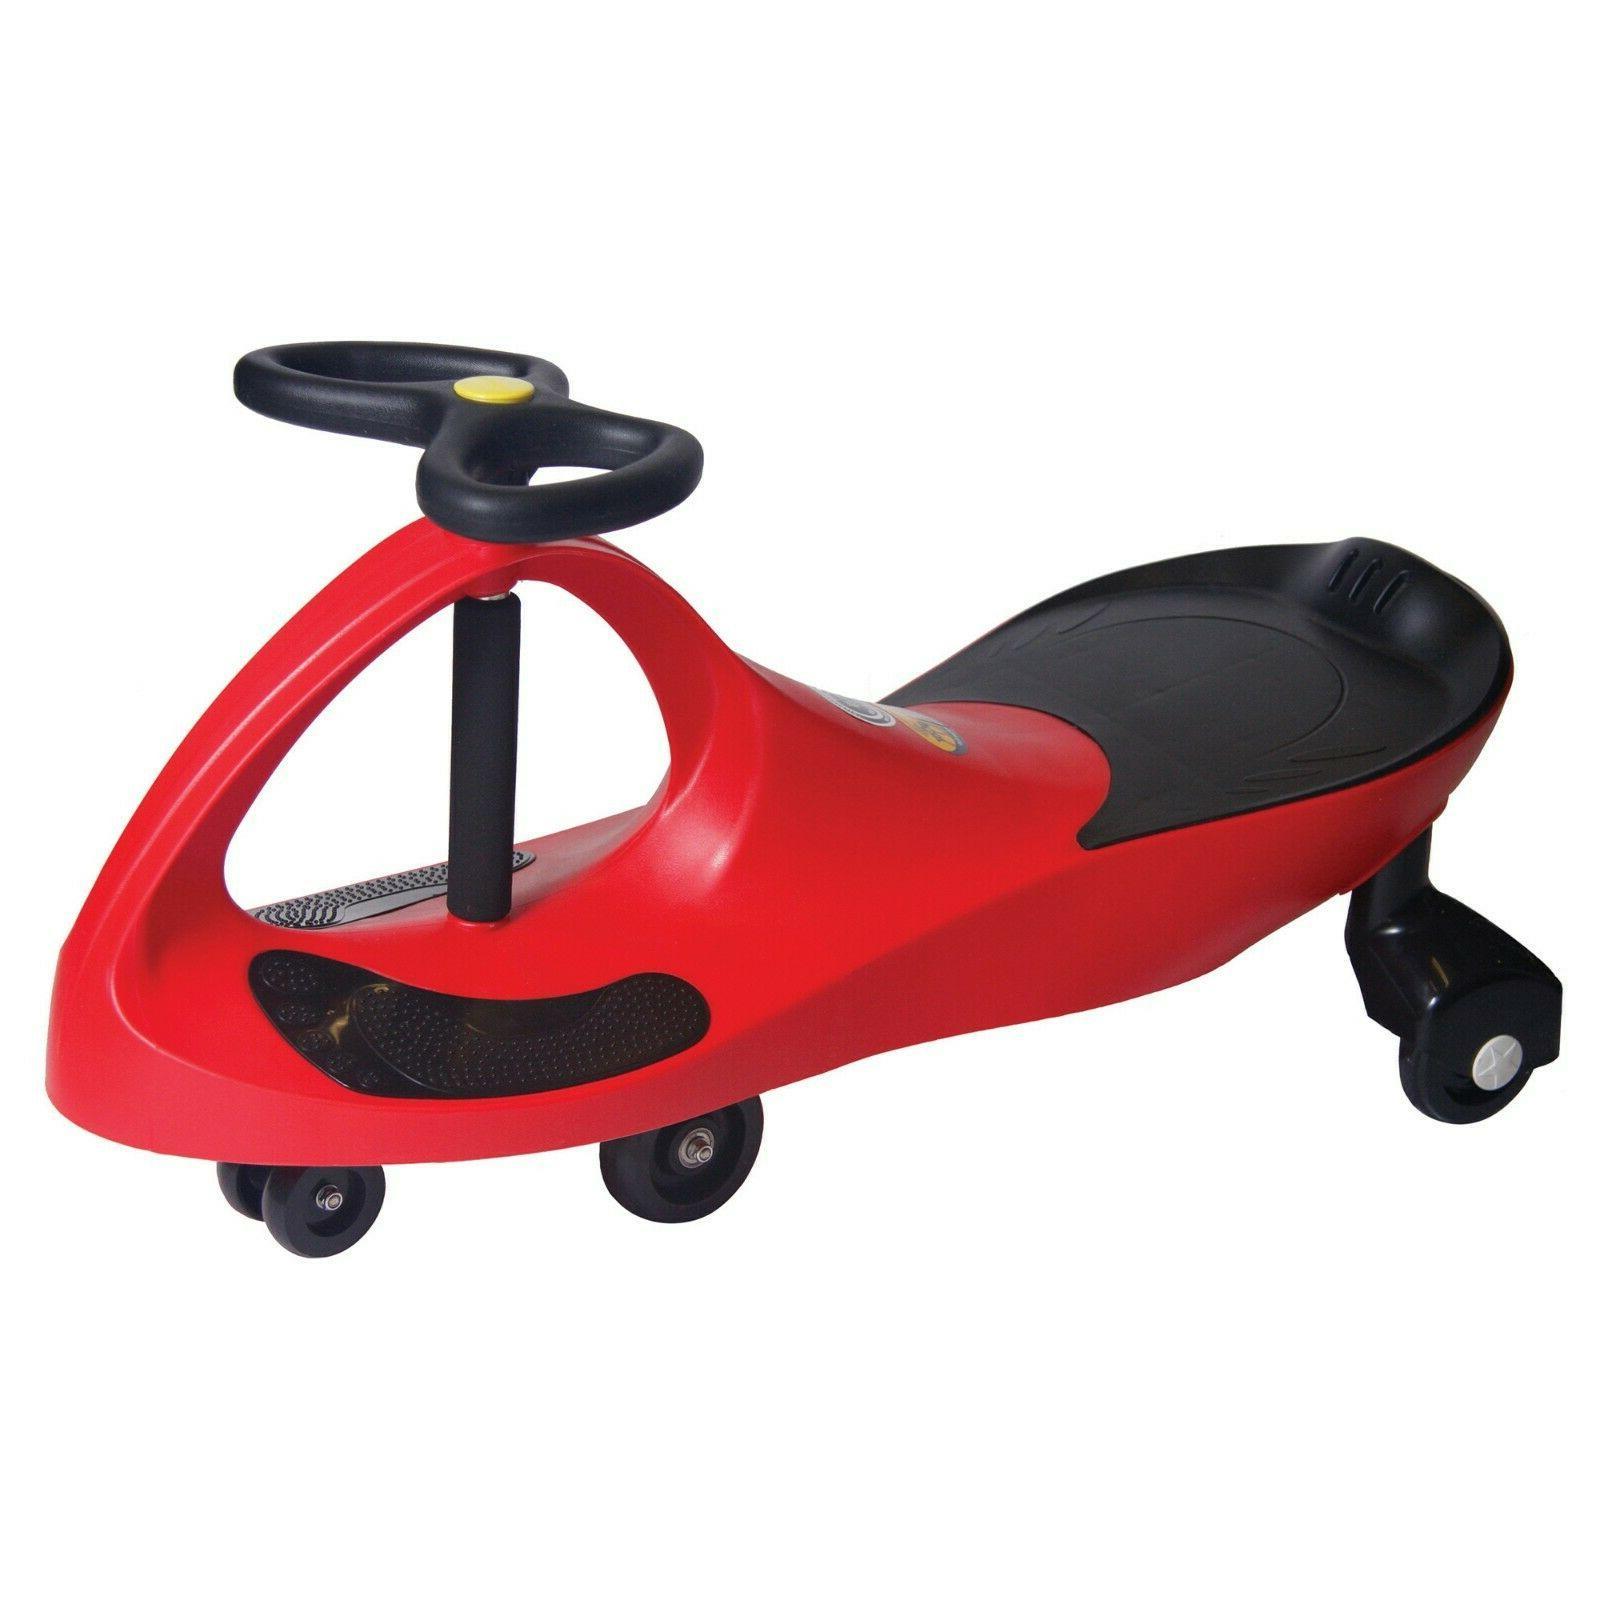 PlaSmart Original Red PlasmaCar Inertia Driven Ride On Toy